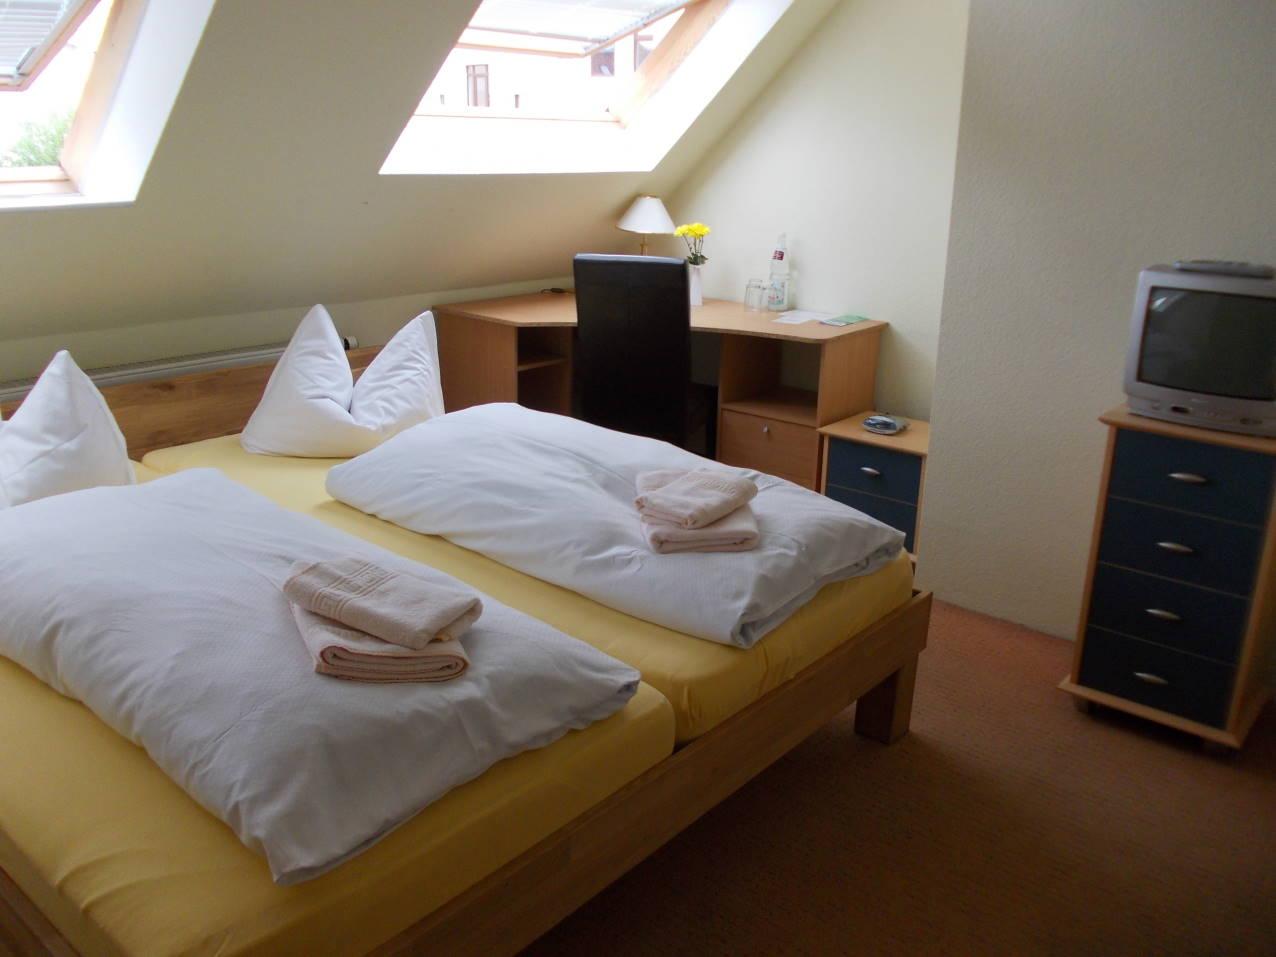 5-bett-appartement-mit-kueche3